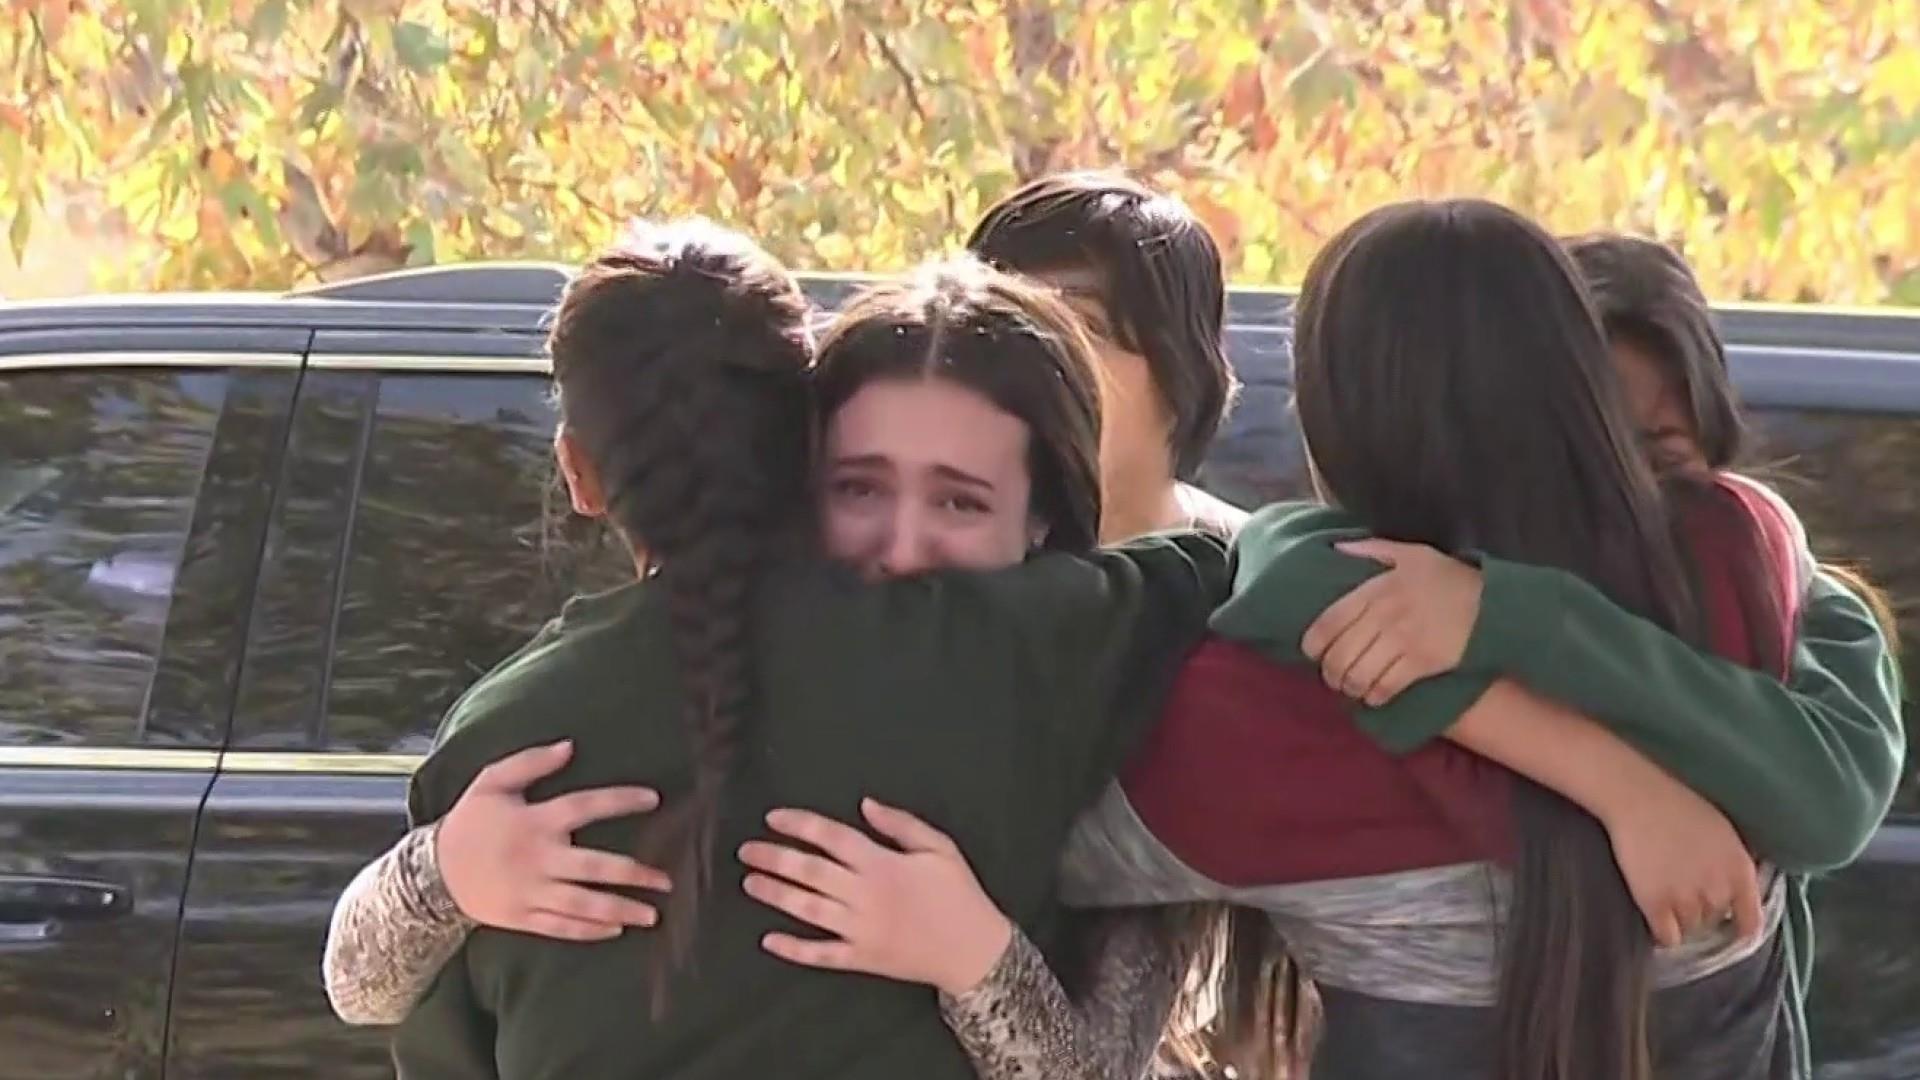 Santa Clarita, California, high school shooting leaves 2 students dead, multiple injured